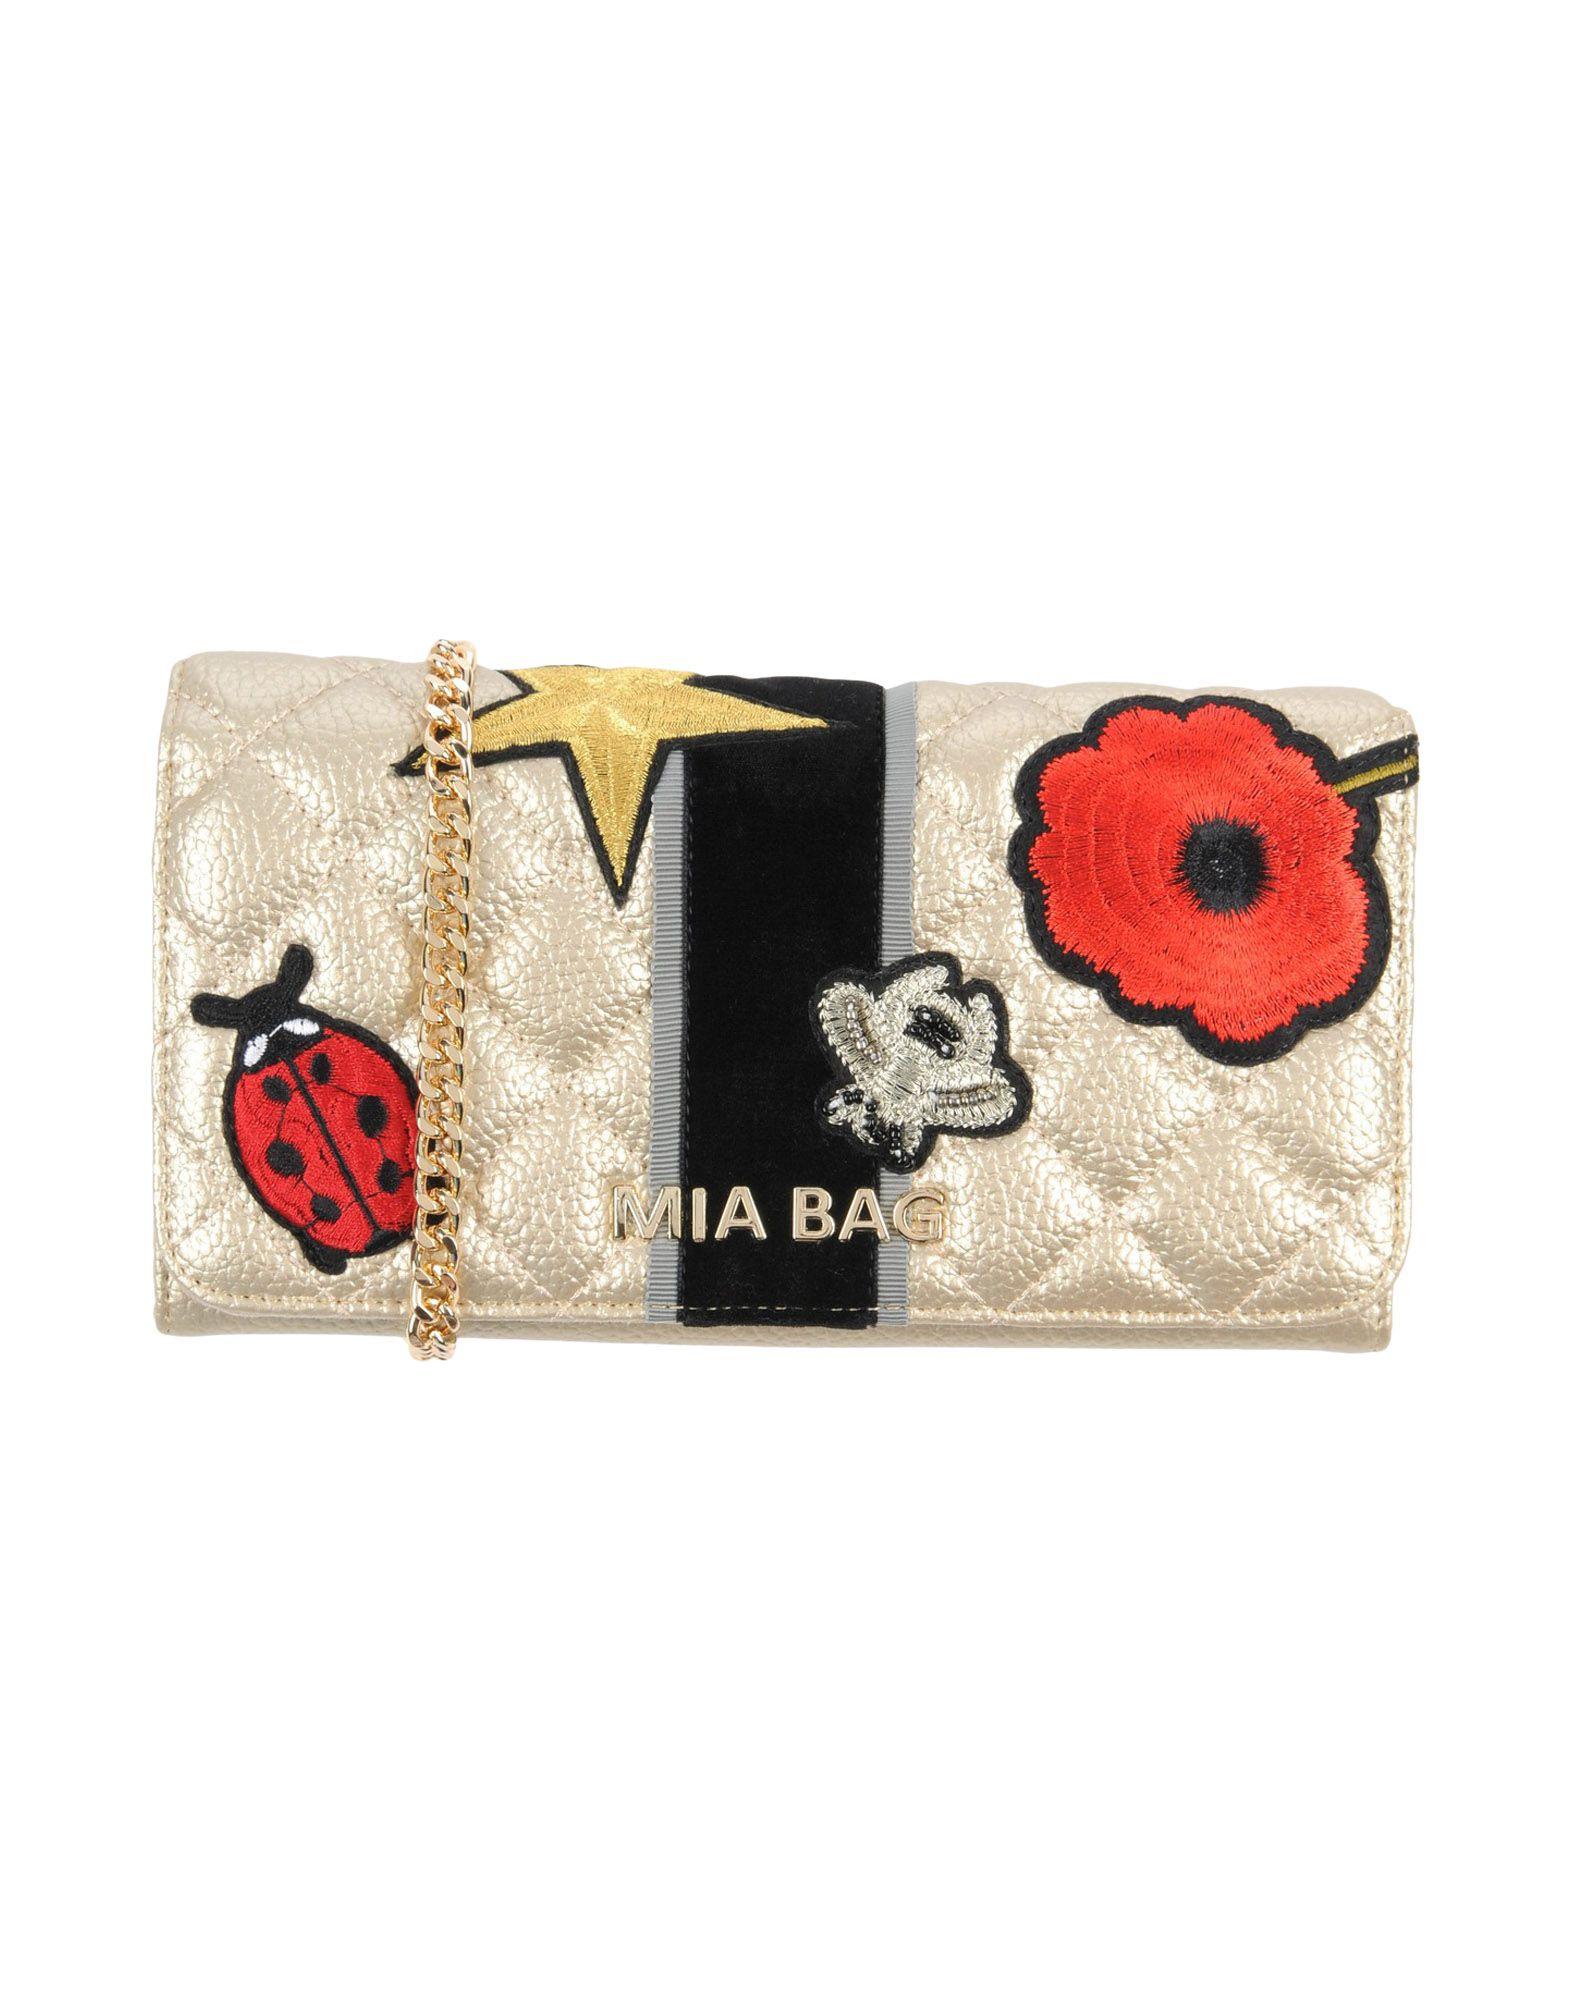 MIA BAG Бумажник makeup organizer travel bag women cosmetic bags summer dumpling clutch women packages waterproof cosmetic bag handbag